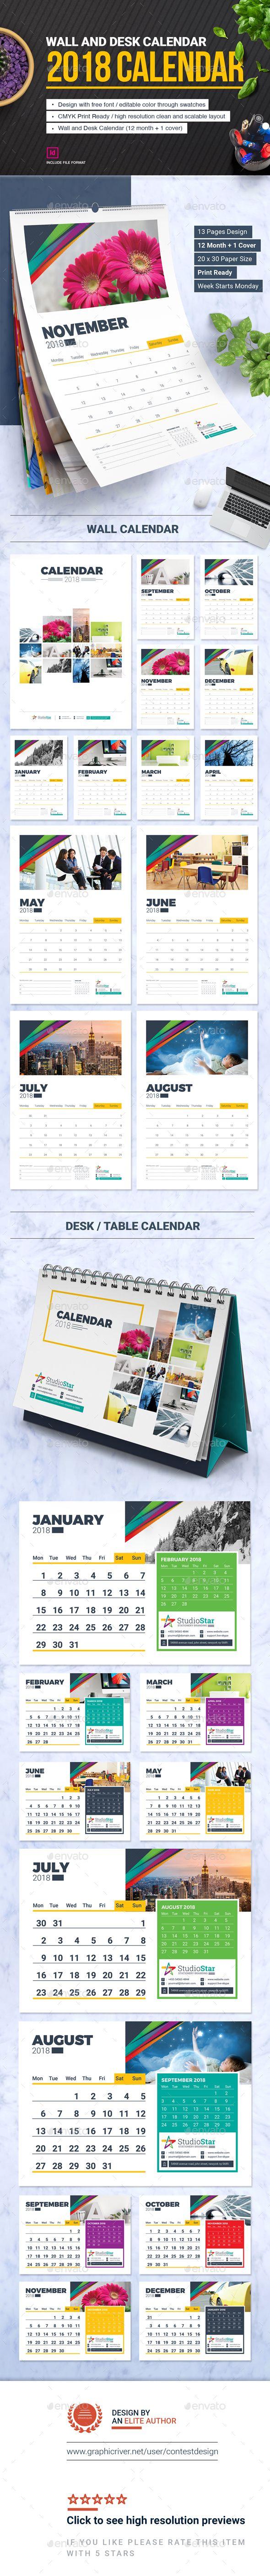 2018 Calendar Design Template | Wall and Desk / Table Calendar 2018